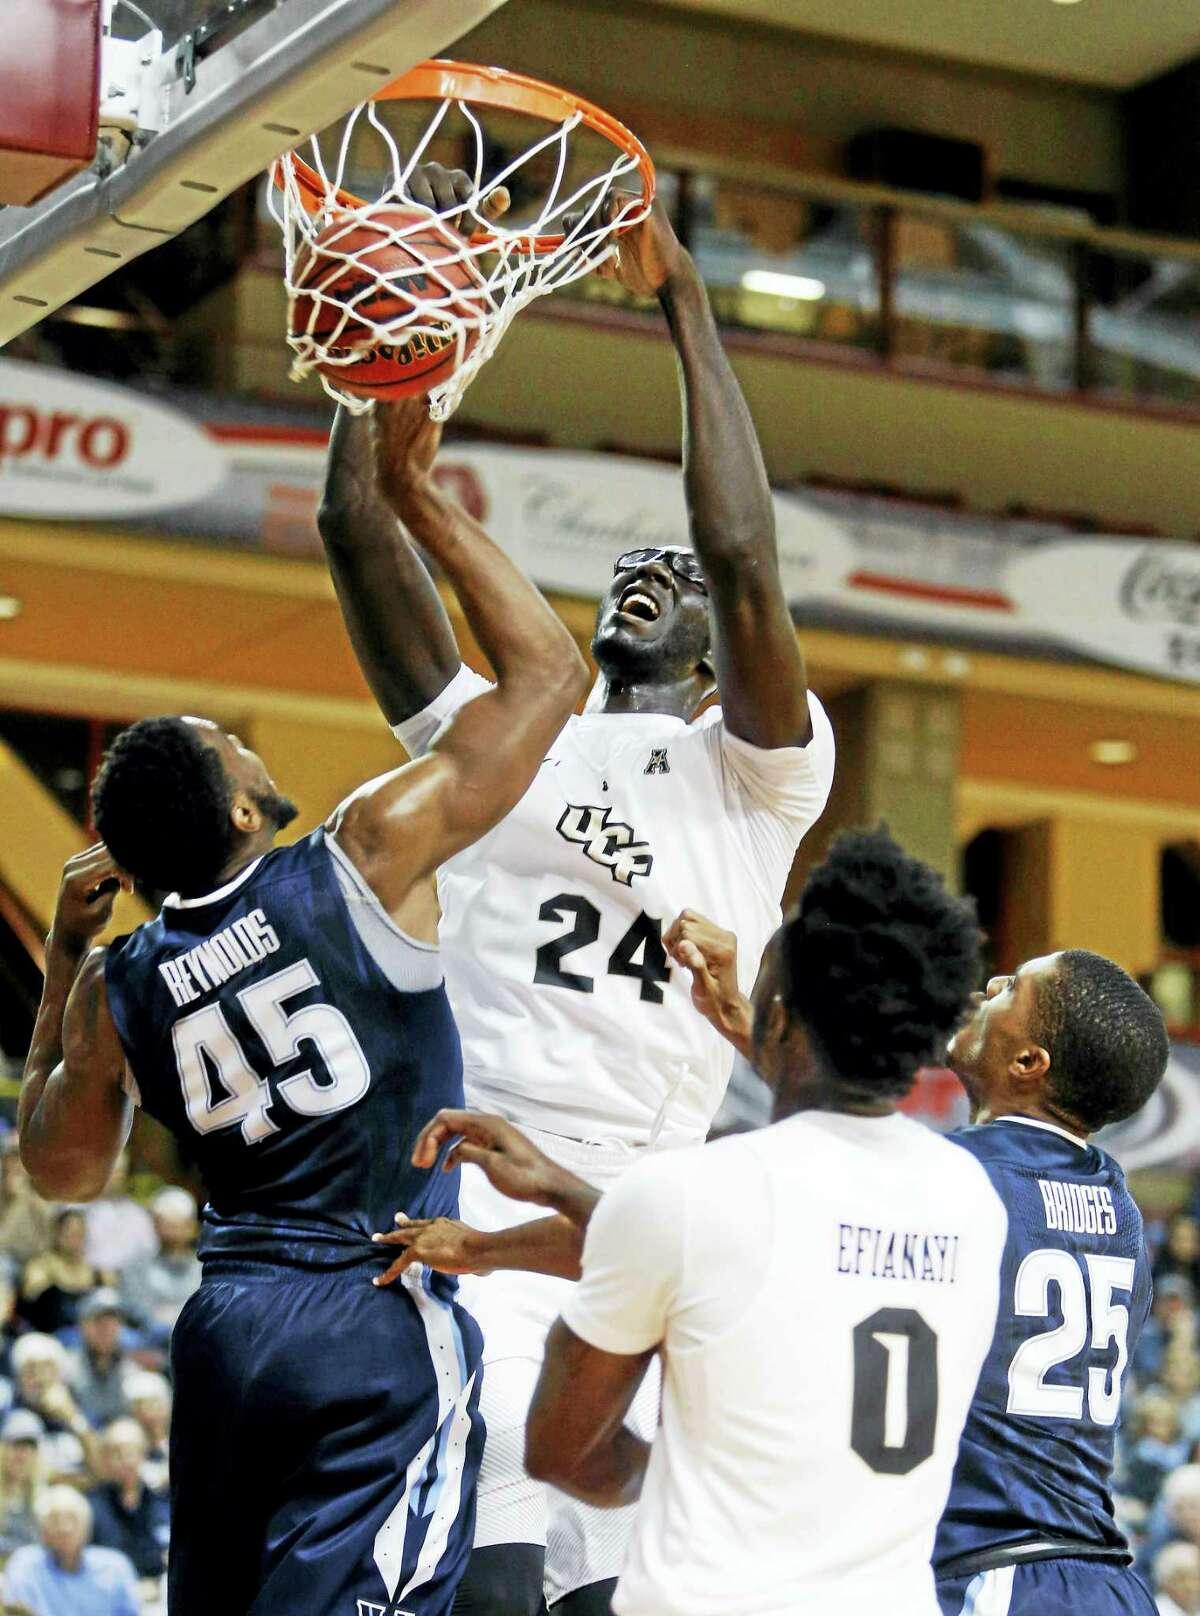 Central Florida's Tacko Fall (24) dunks over the defense of Villanova's Darryl Reynolds.